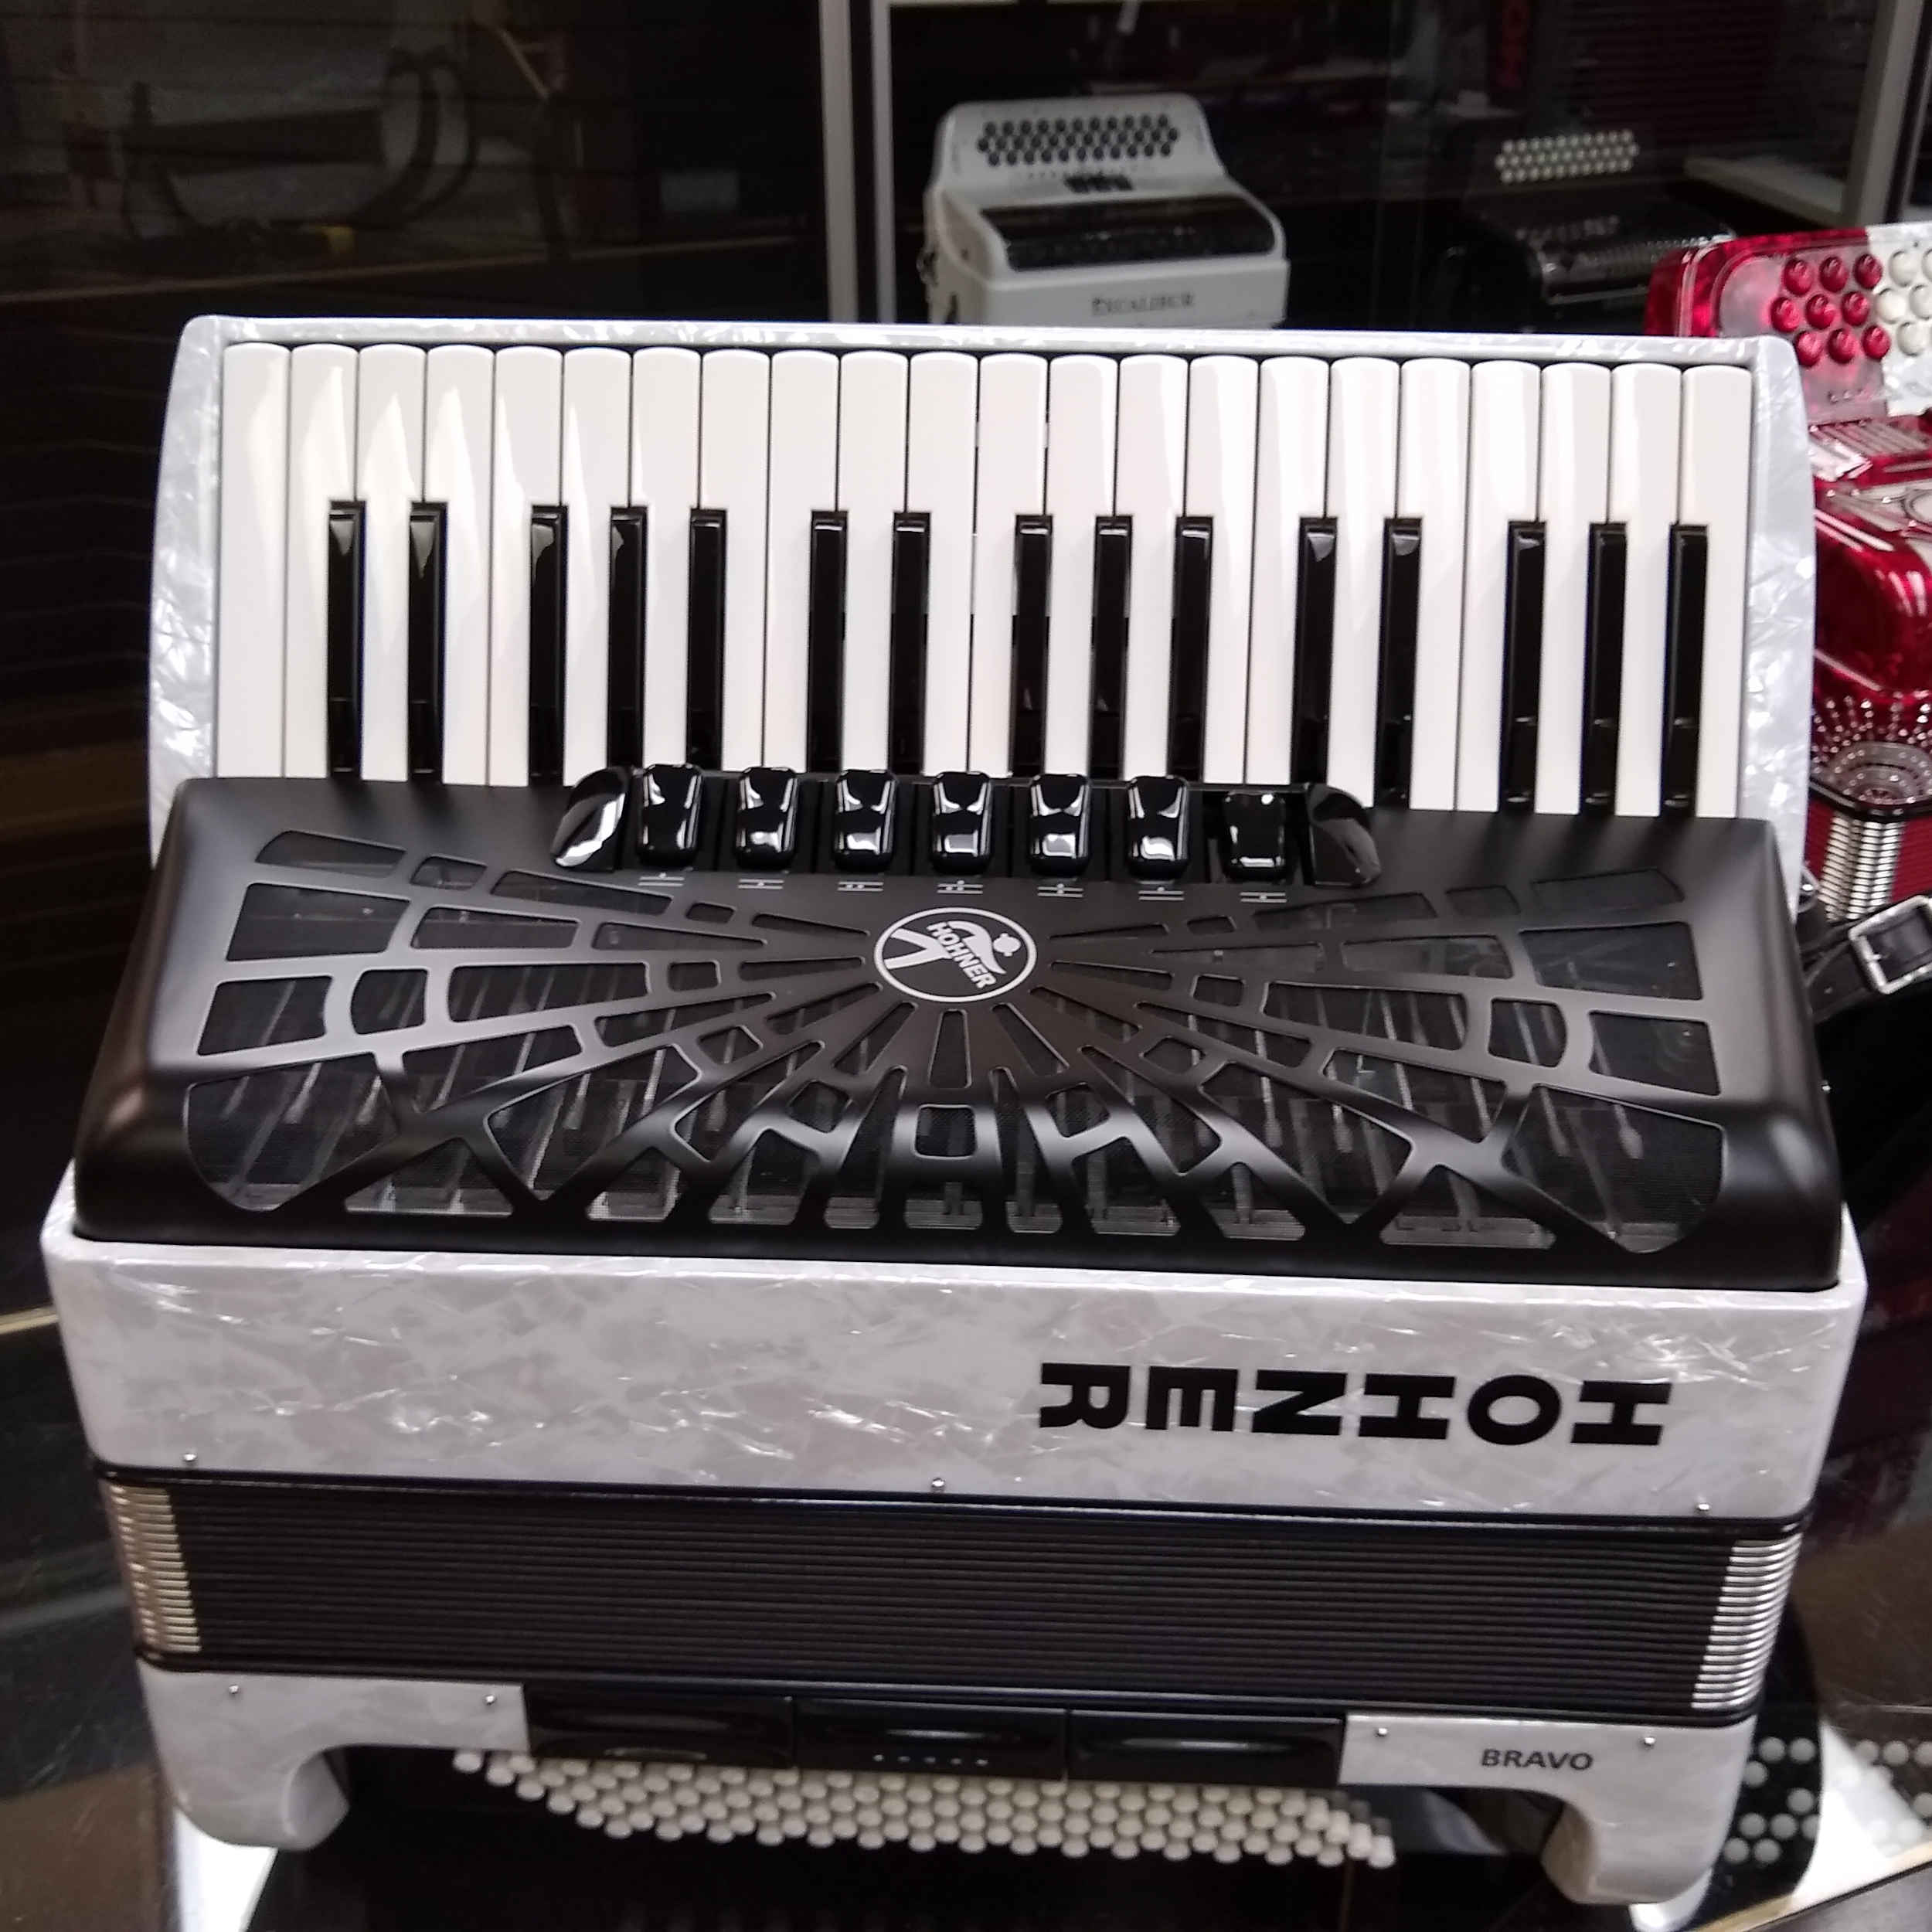 Hohner Bravo III 96 Bass Piano Accordion White Polish